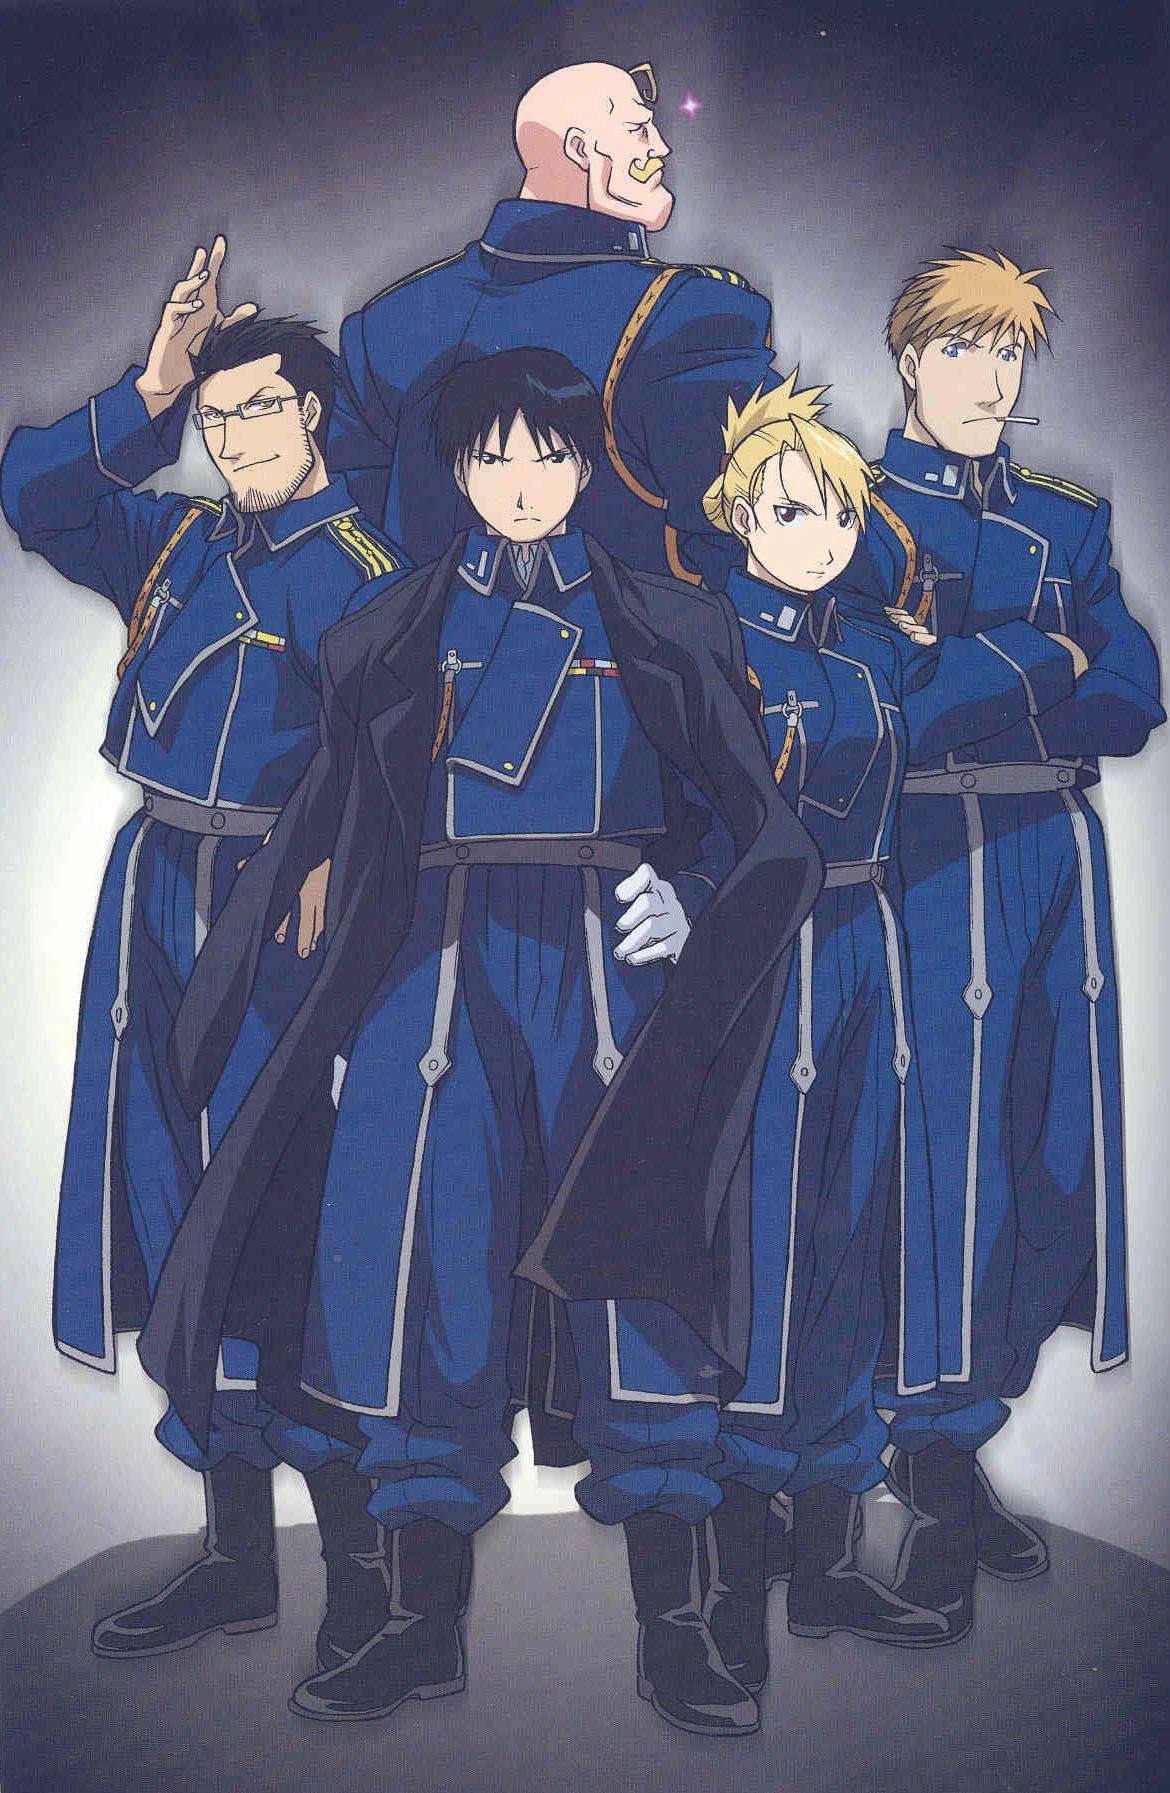 Photo of Fullmetal Alchemist: Brotherhood | FMA | Roy Mustang and squad | Anime | Fanart …